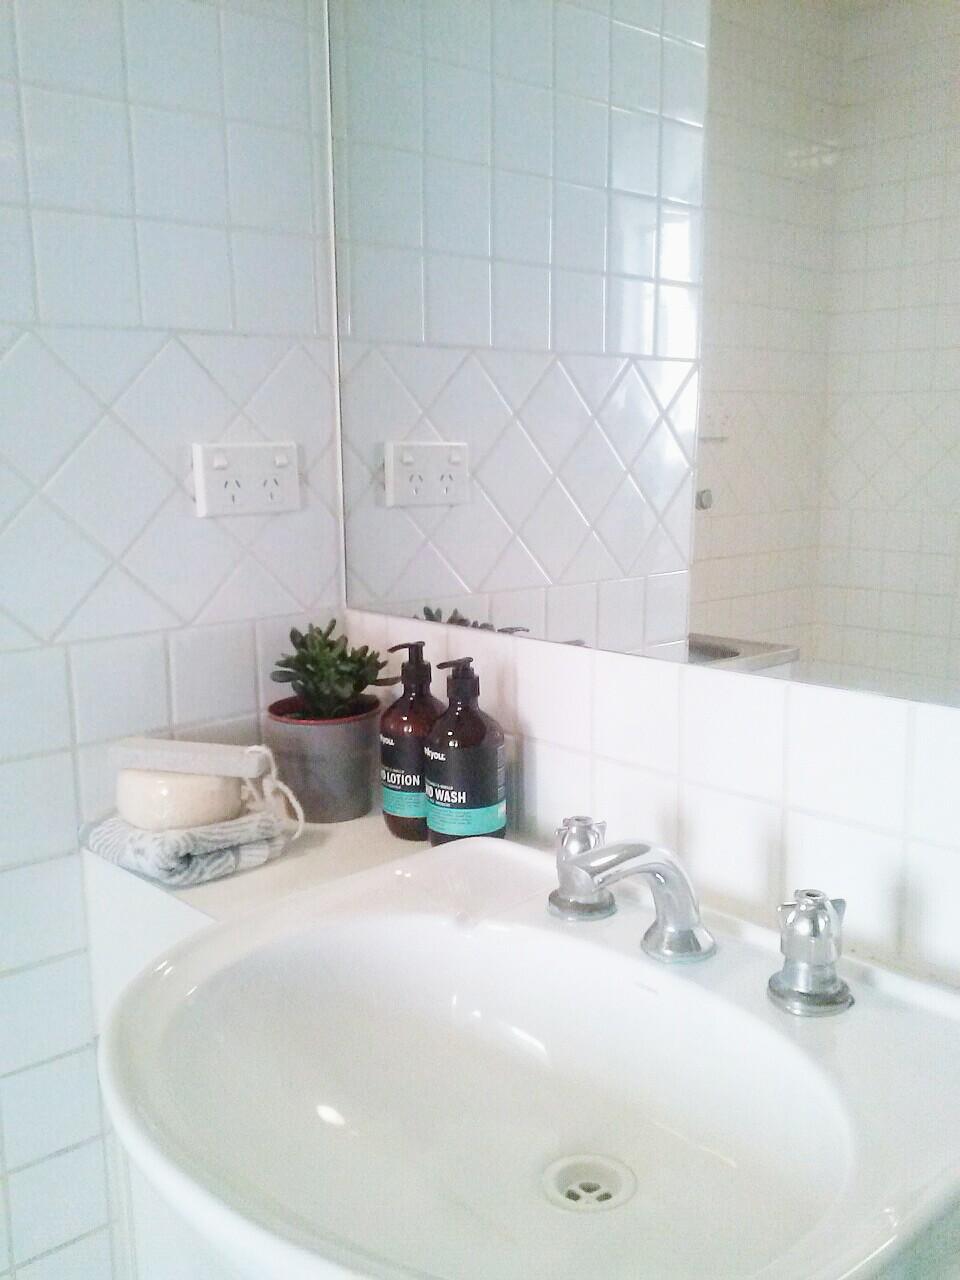 Henty House Unit 107 501 Little Collins Street Melbourne Bathroom ...